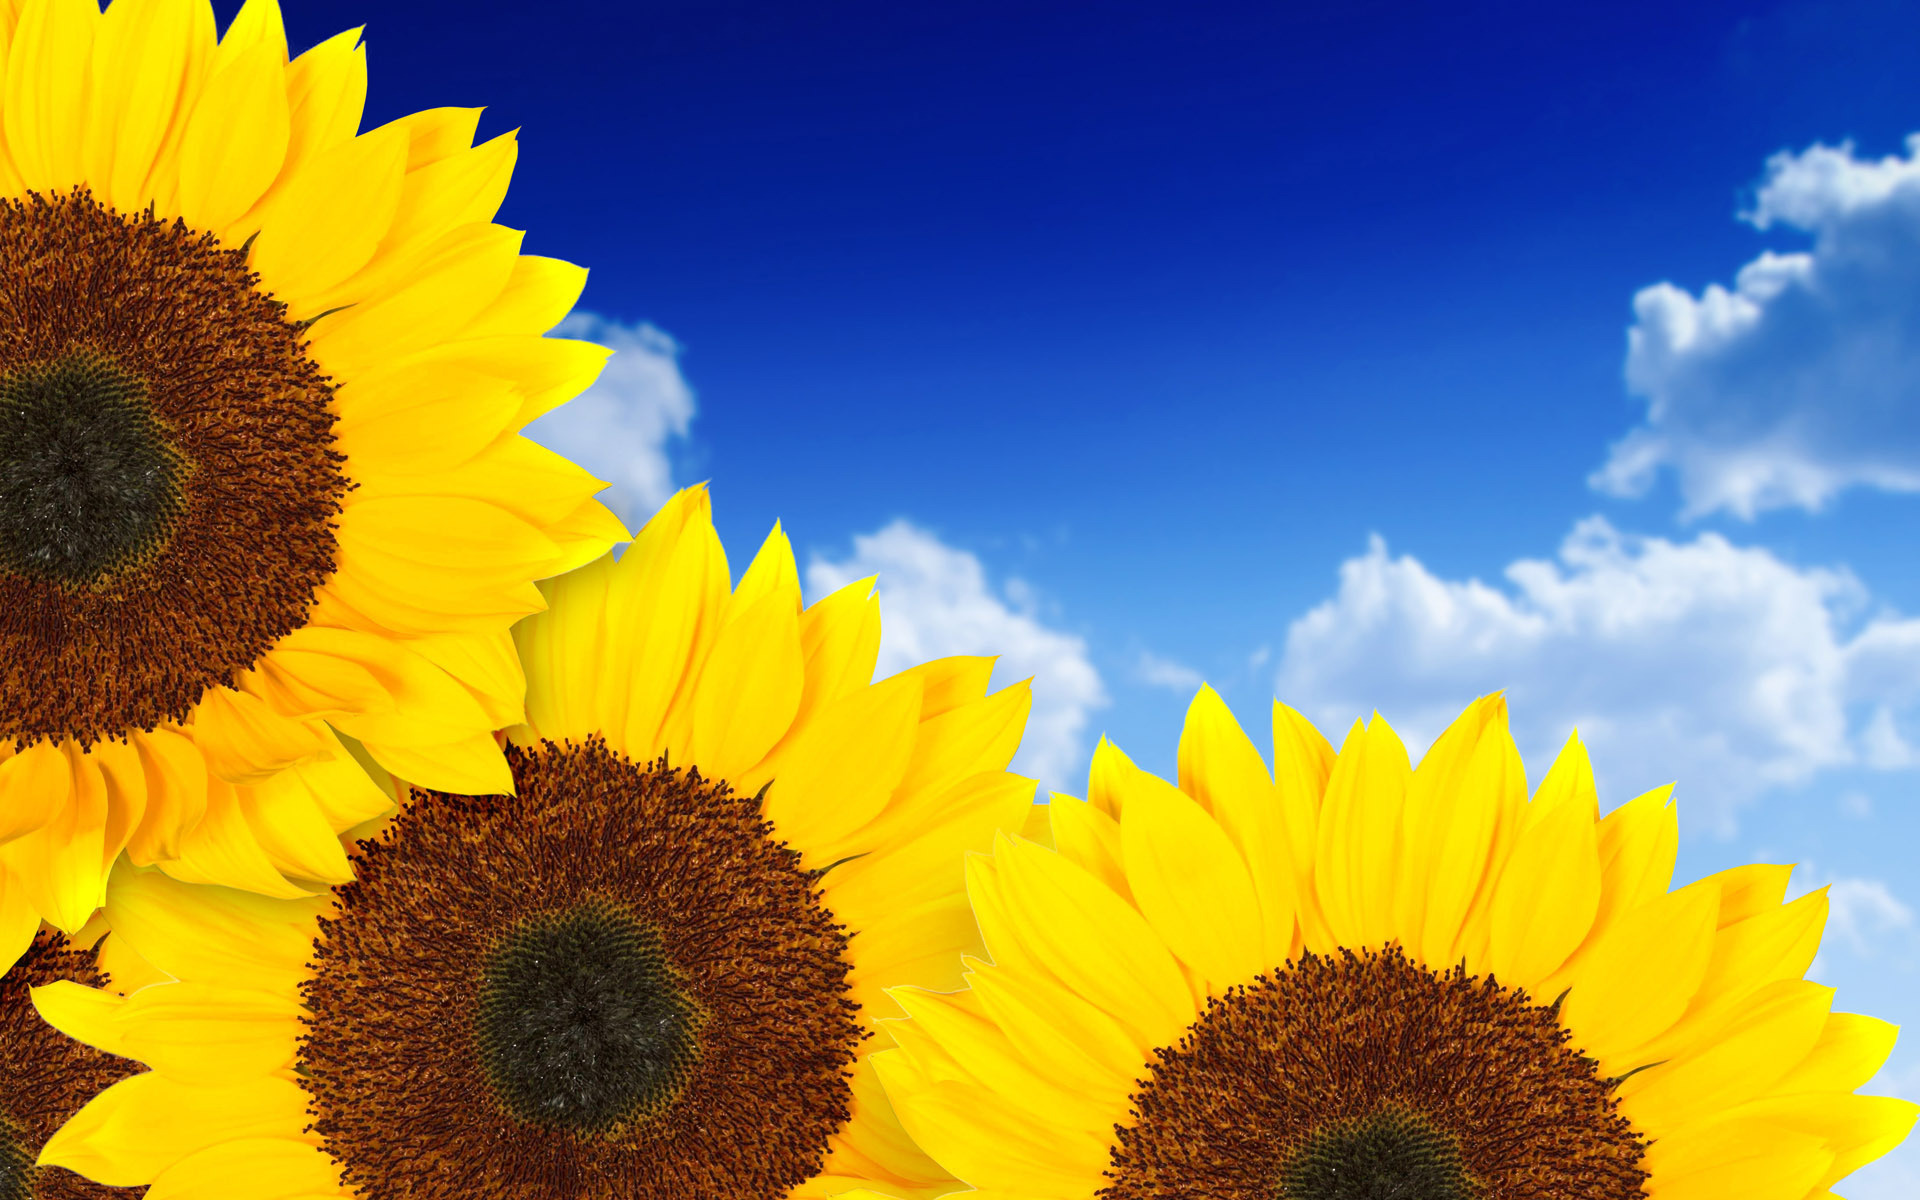 Download Sunflower Wallpaper 16052 1920x1200 px High Resolution ...